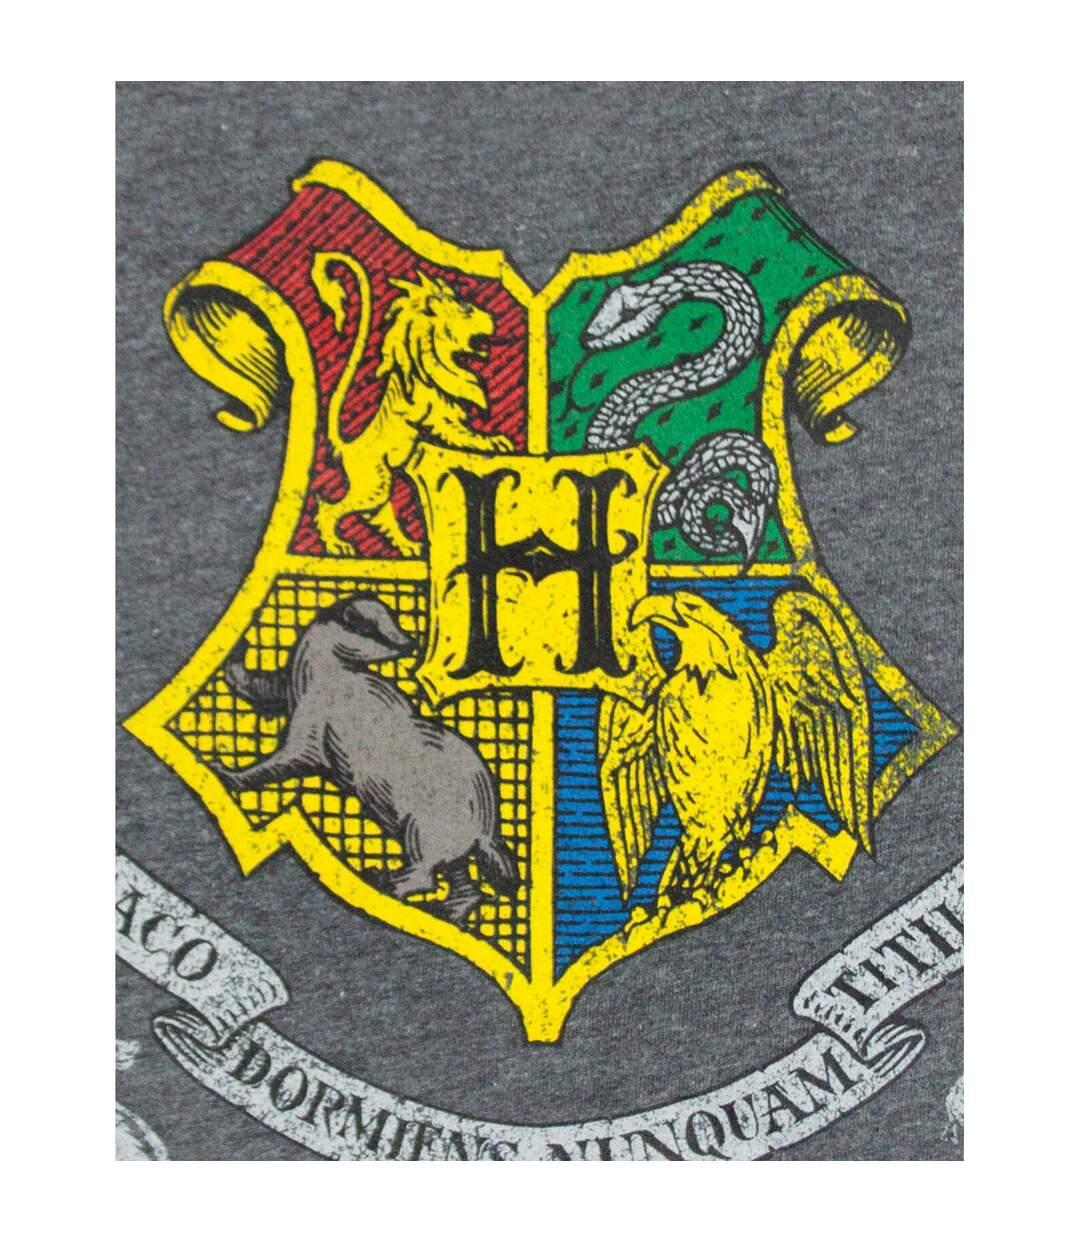 Harry Potter Mens Hogwarts T-Shirt (Charcoal) - UTNS5732